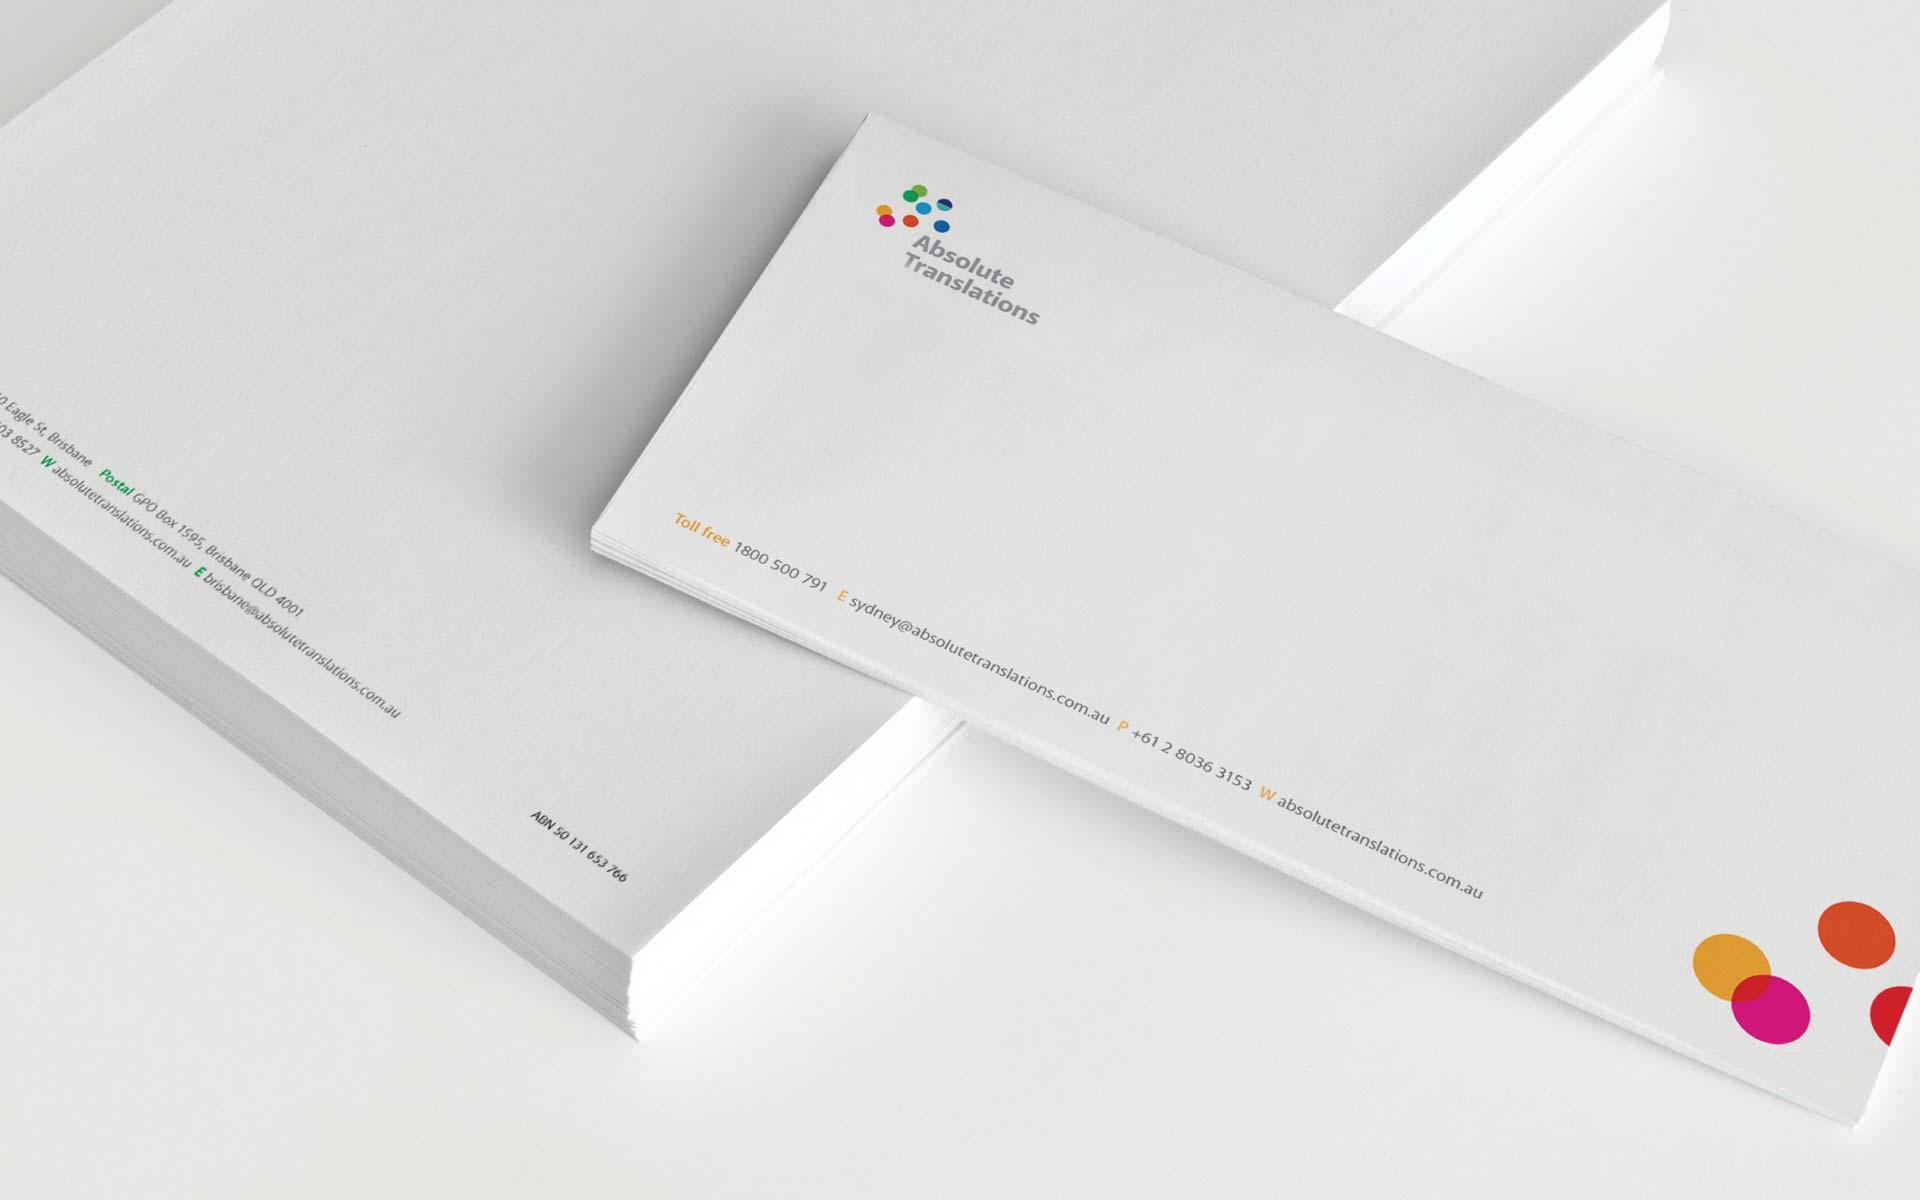 Absolute Tranlsations Logo Design With Compliements Letterhead